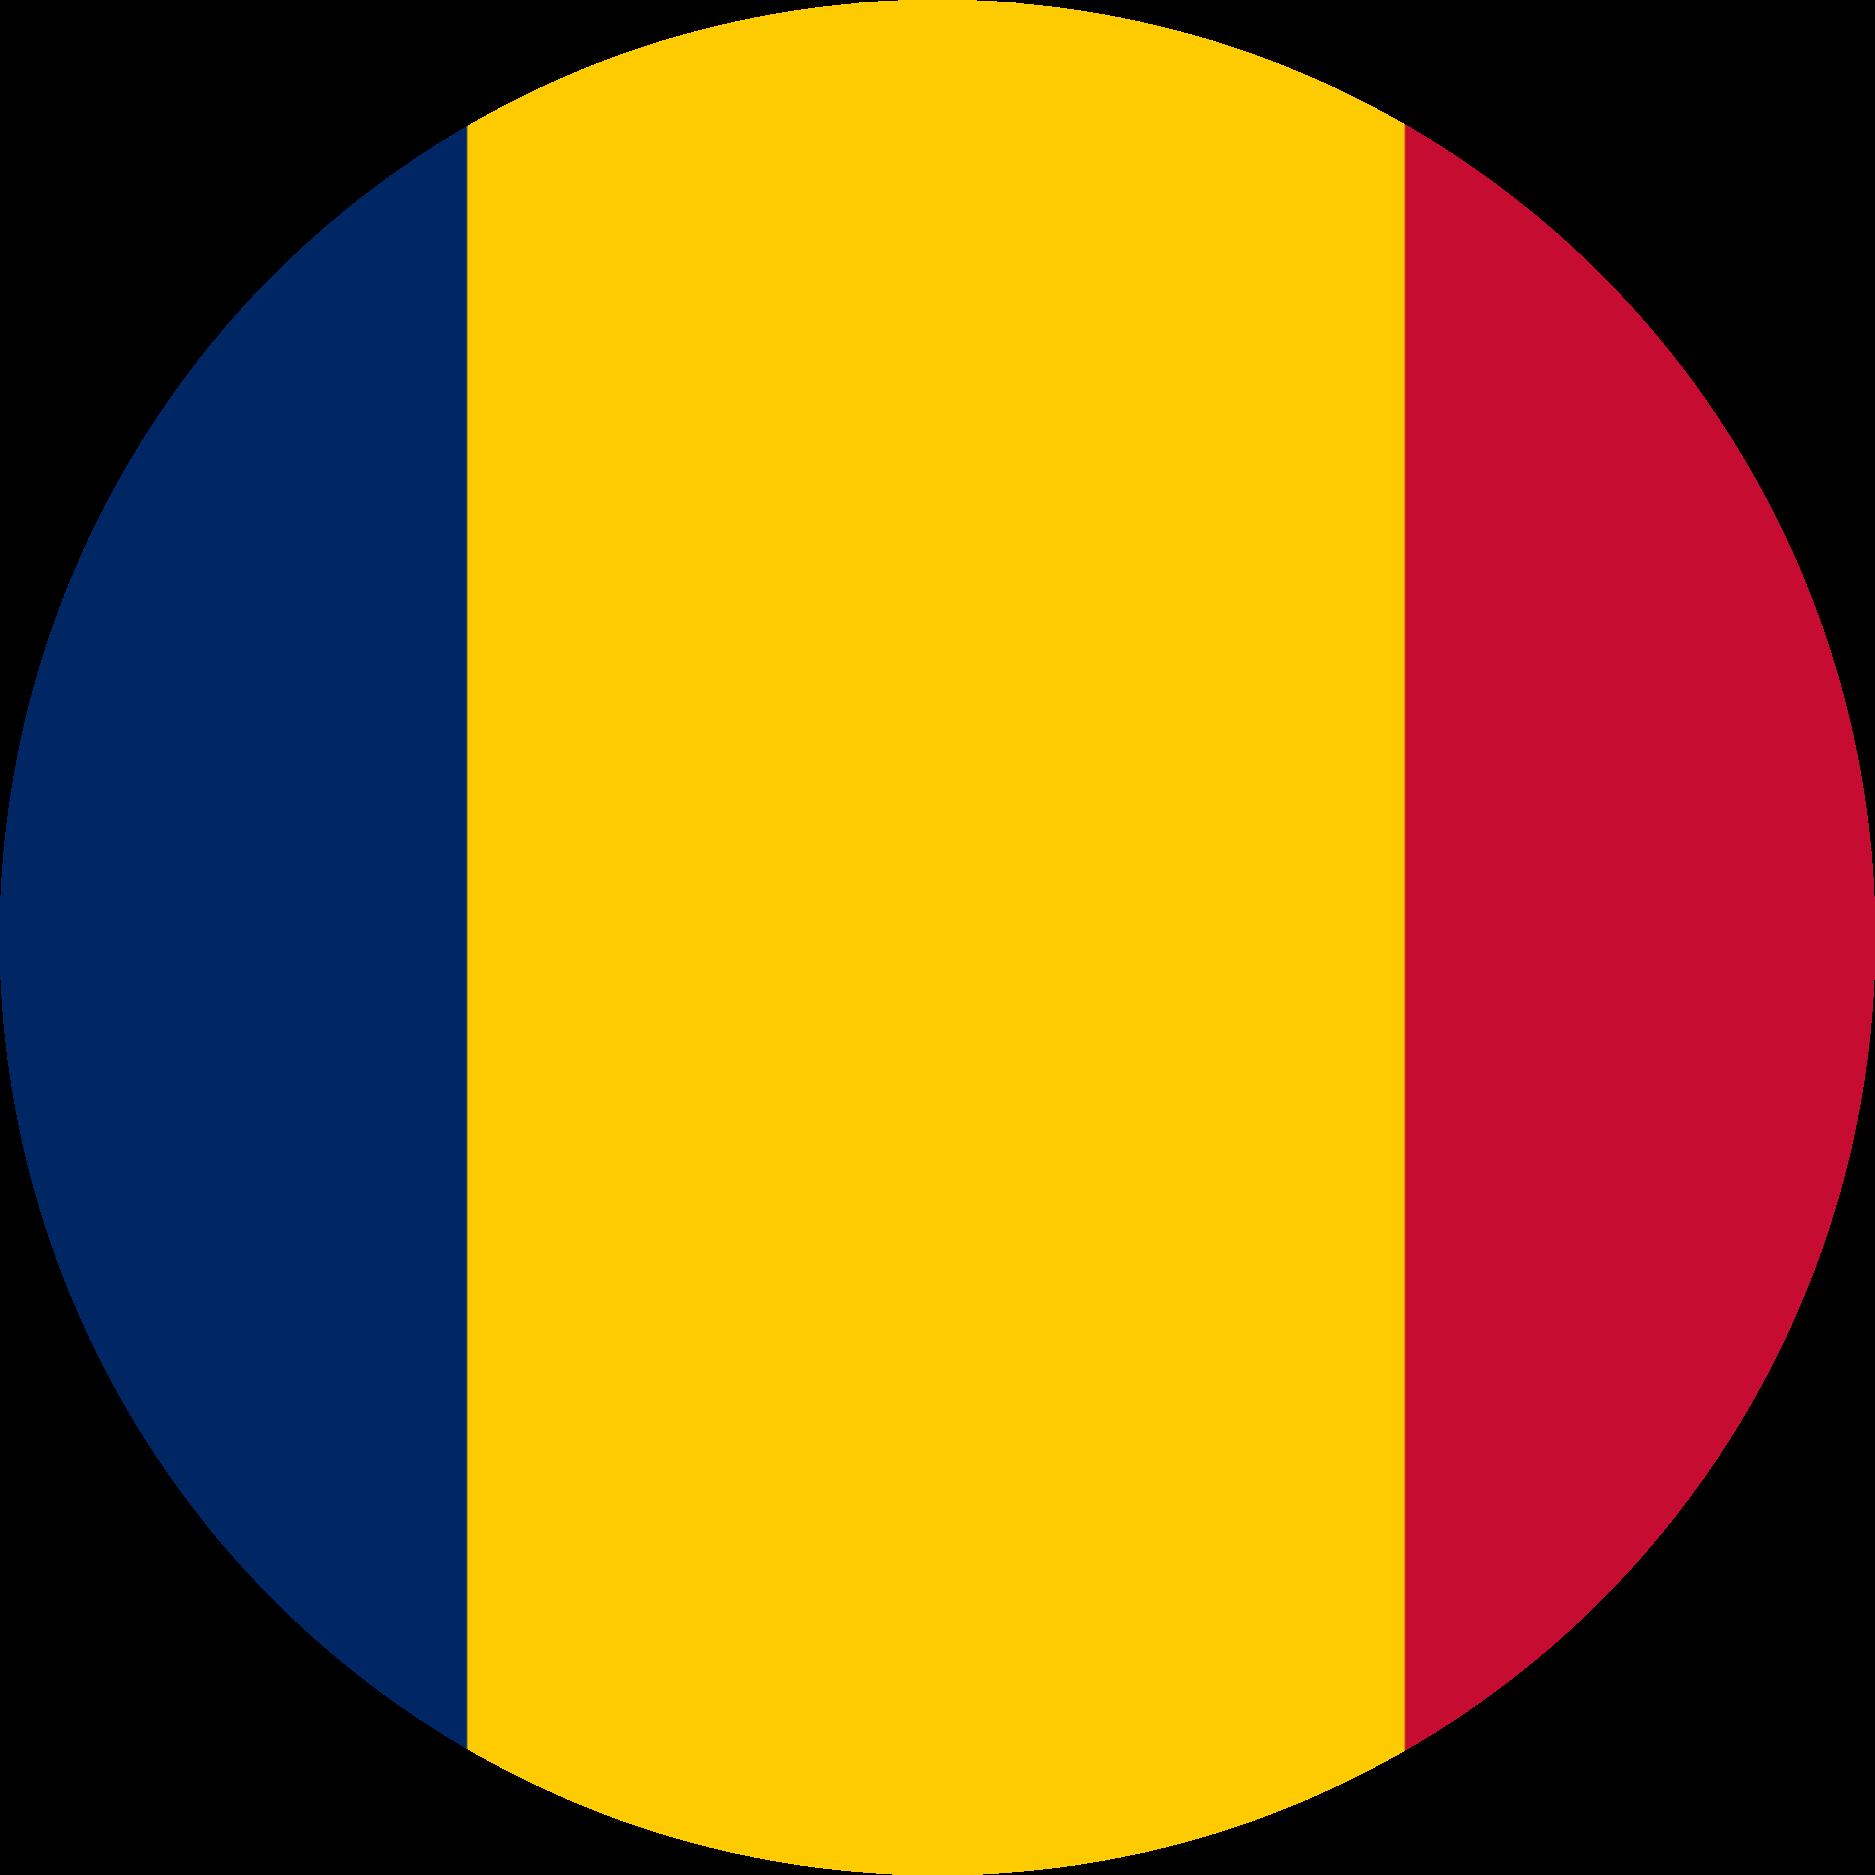 Chad Flag Emoji